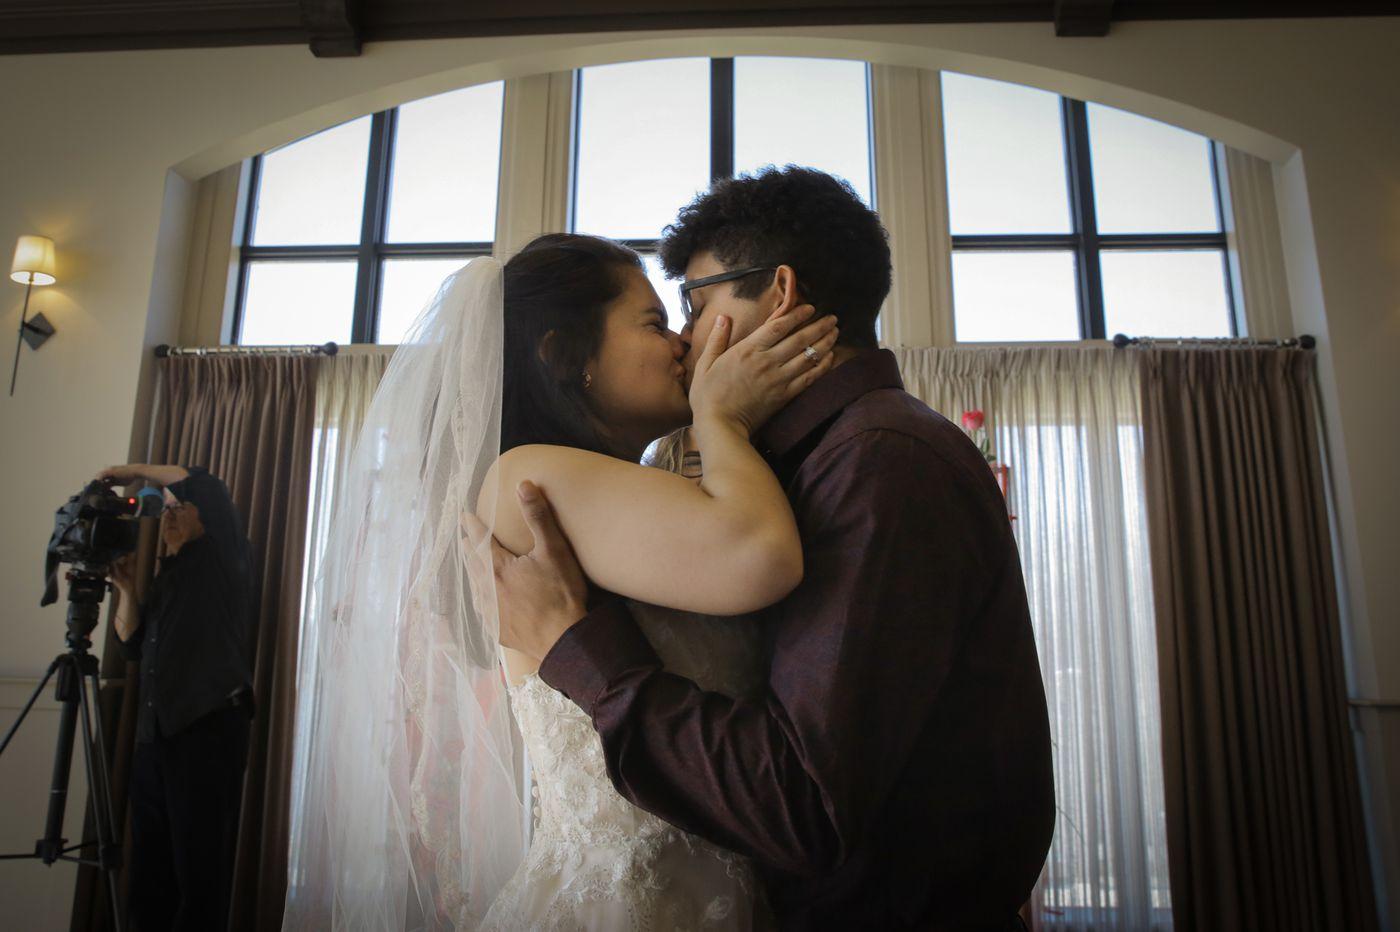 Valentine's Day vows: A wedding postponed seven times, a math teacher on her lunch break